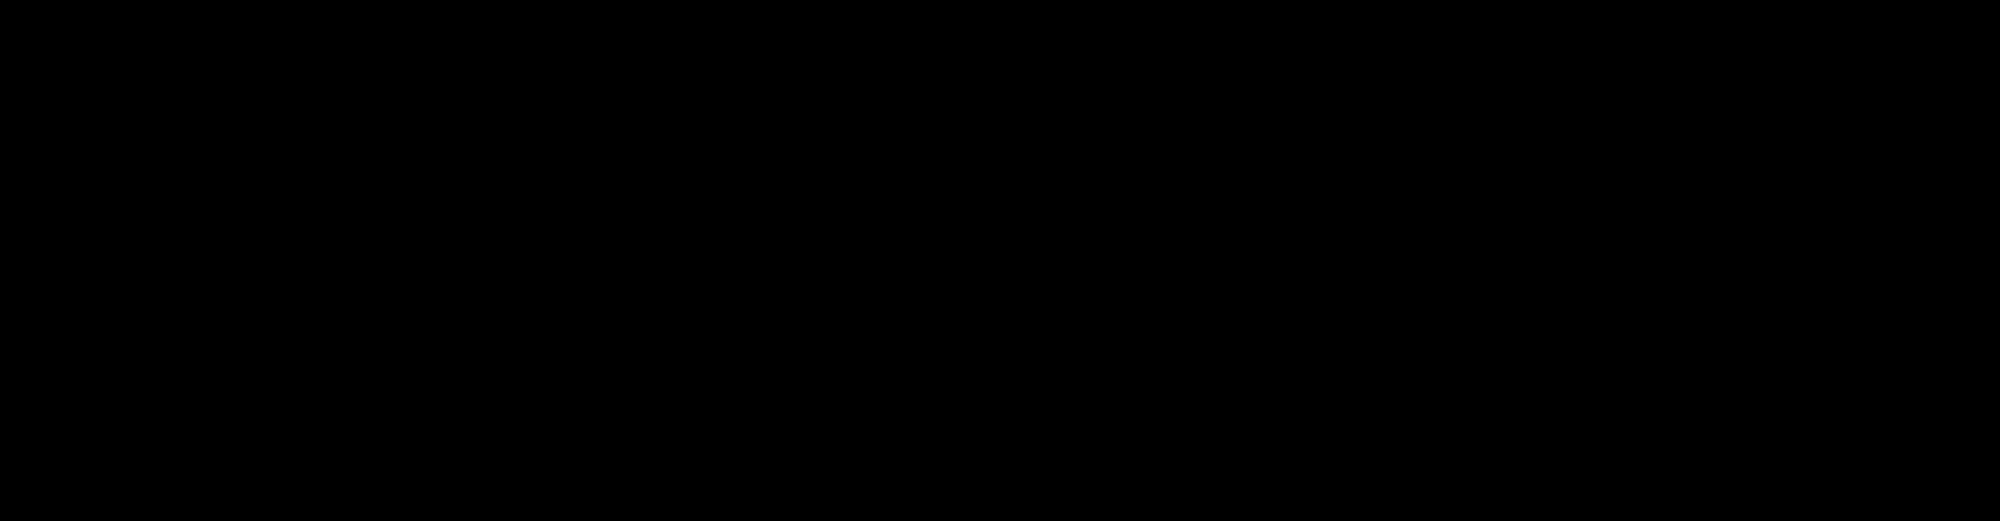 Cincinnati Chocolate Society-logo-black.png